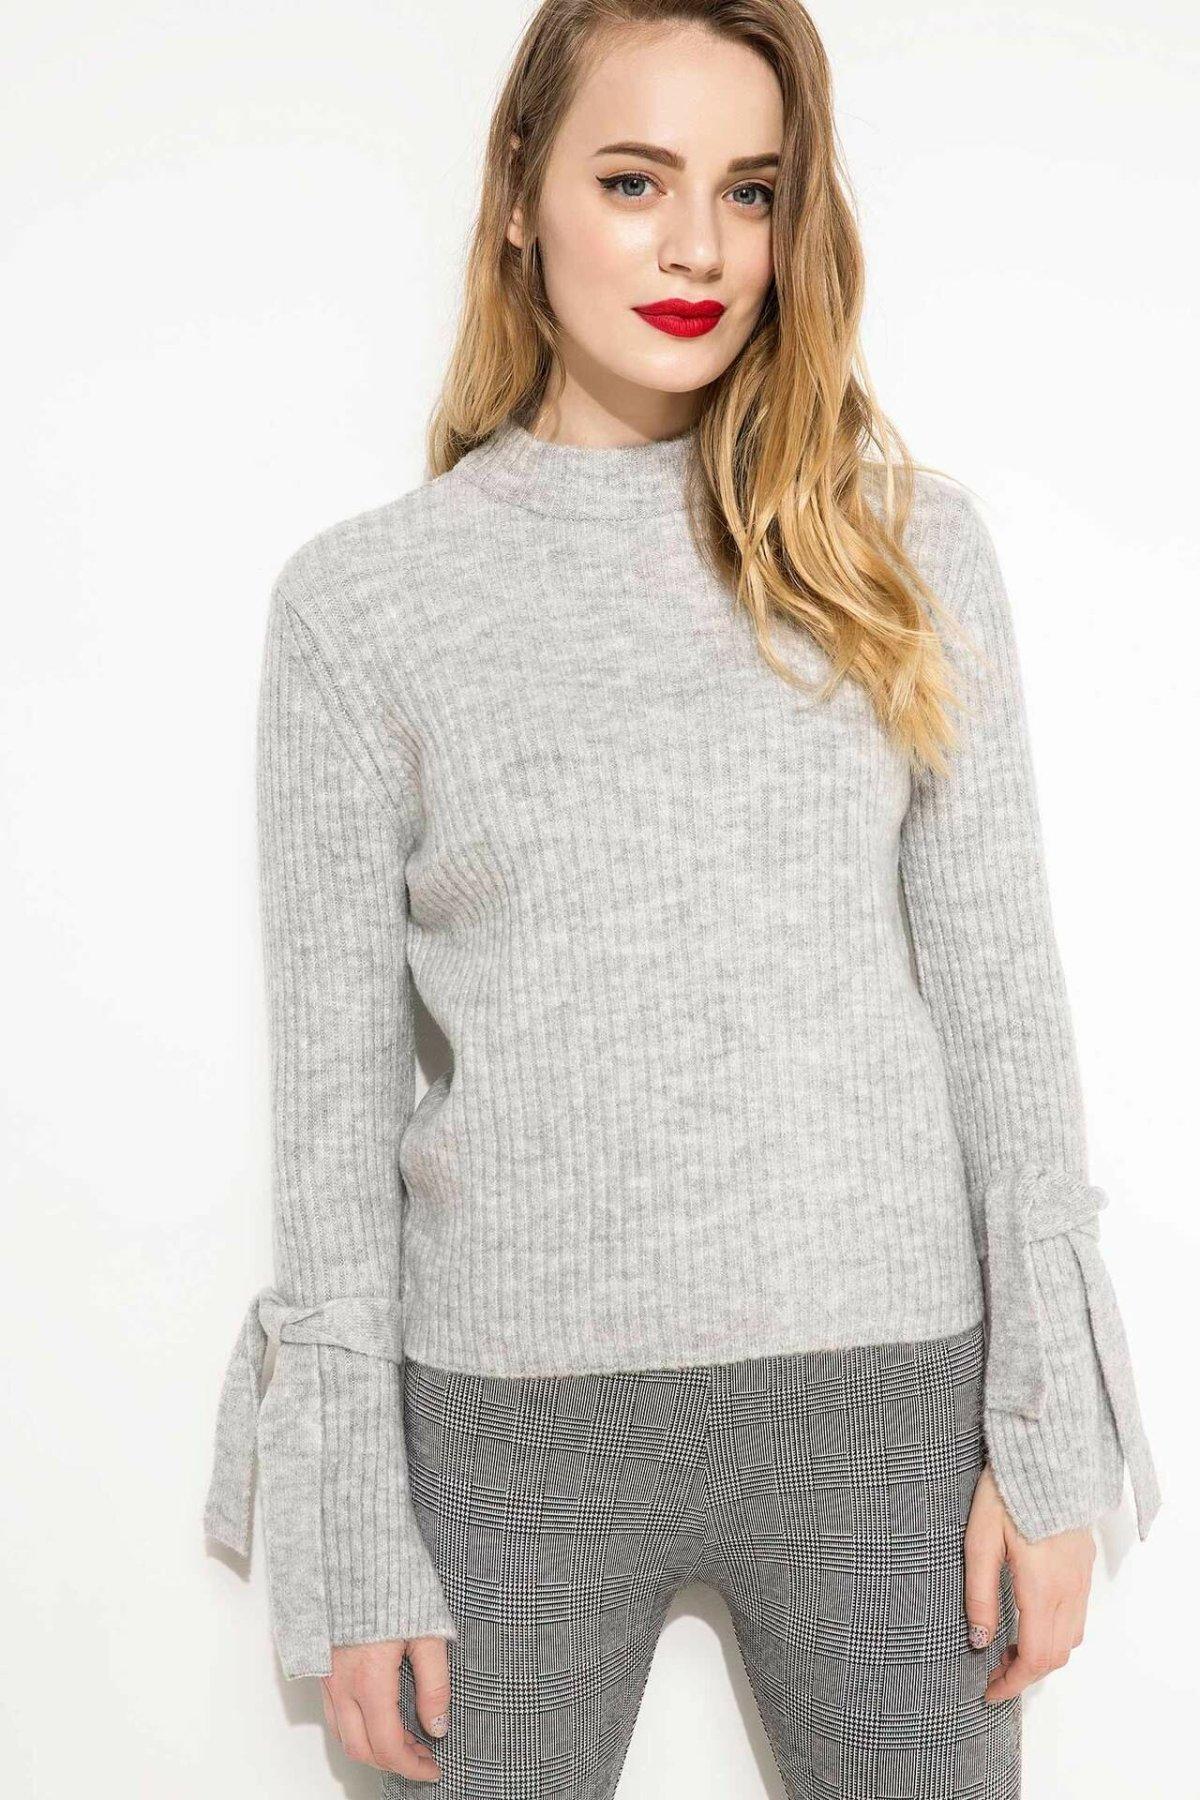 DeFacto Women Simple O-neck Flare Sleeves Pullover Sweatshirts Fashion Leisure Knitted Tops Female -H6579AZ17WN-H6579AZ17WN